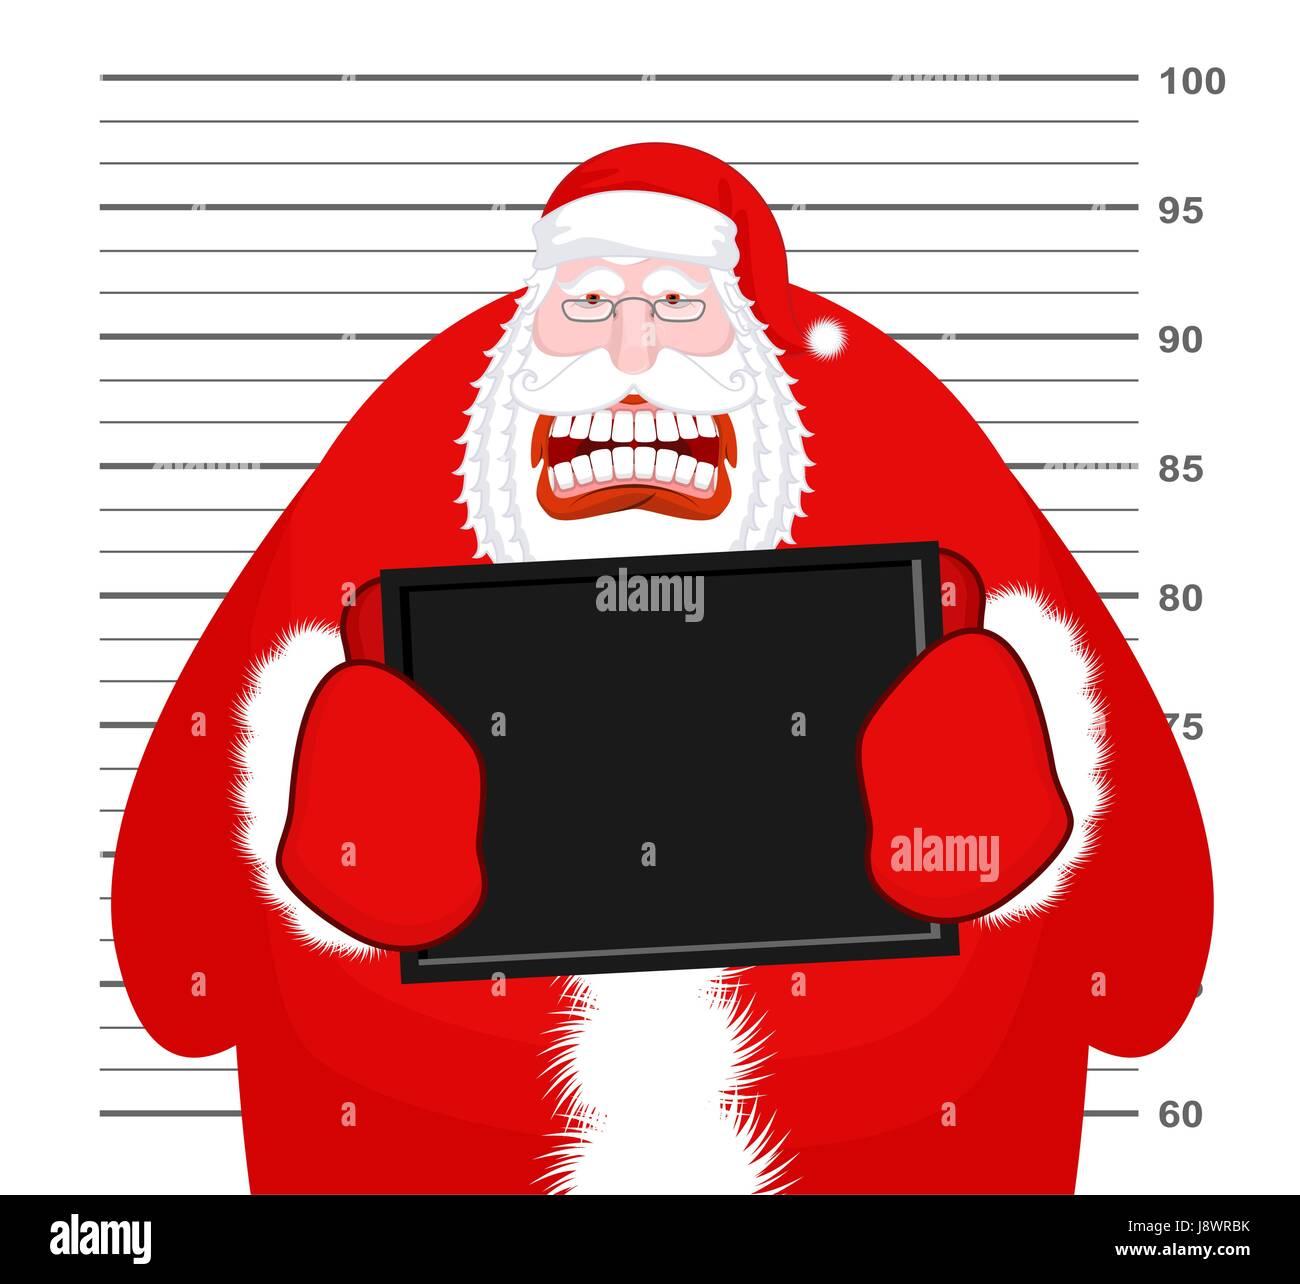 http://c8.alamy.com/comp/J8WRBK/mugshot-santa-claus-at-police-department-mug-shot-christmas-arrested-J8WRBK.jpg